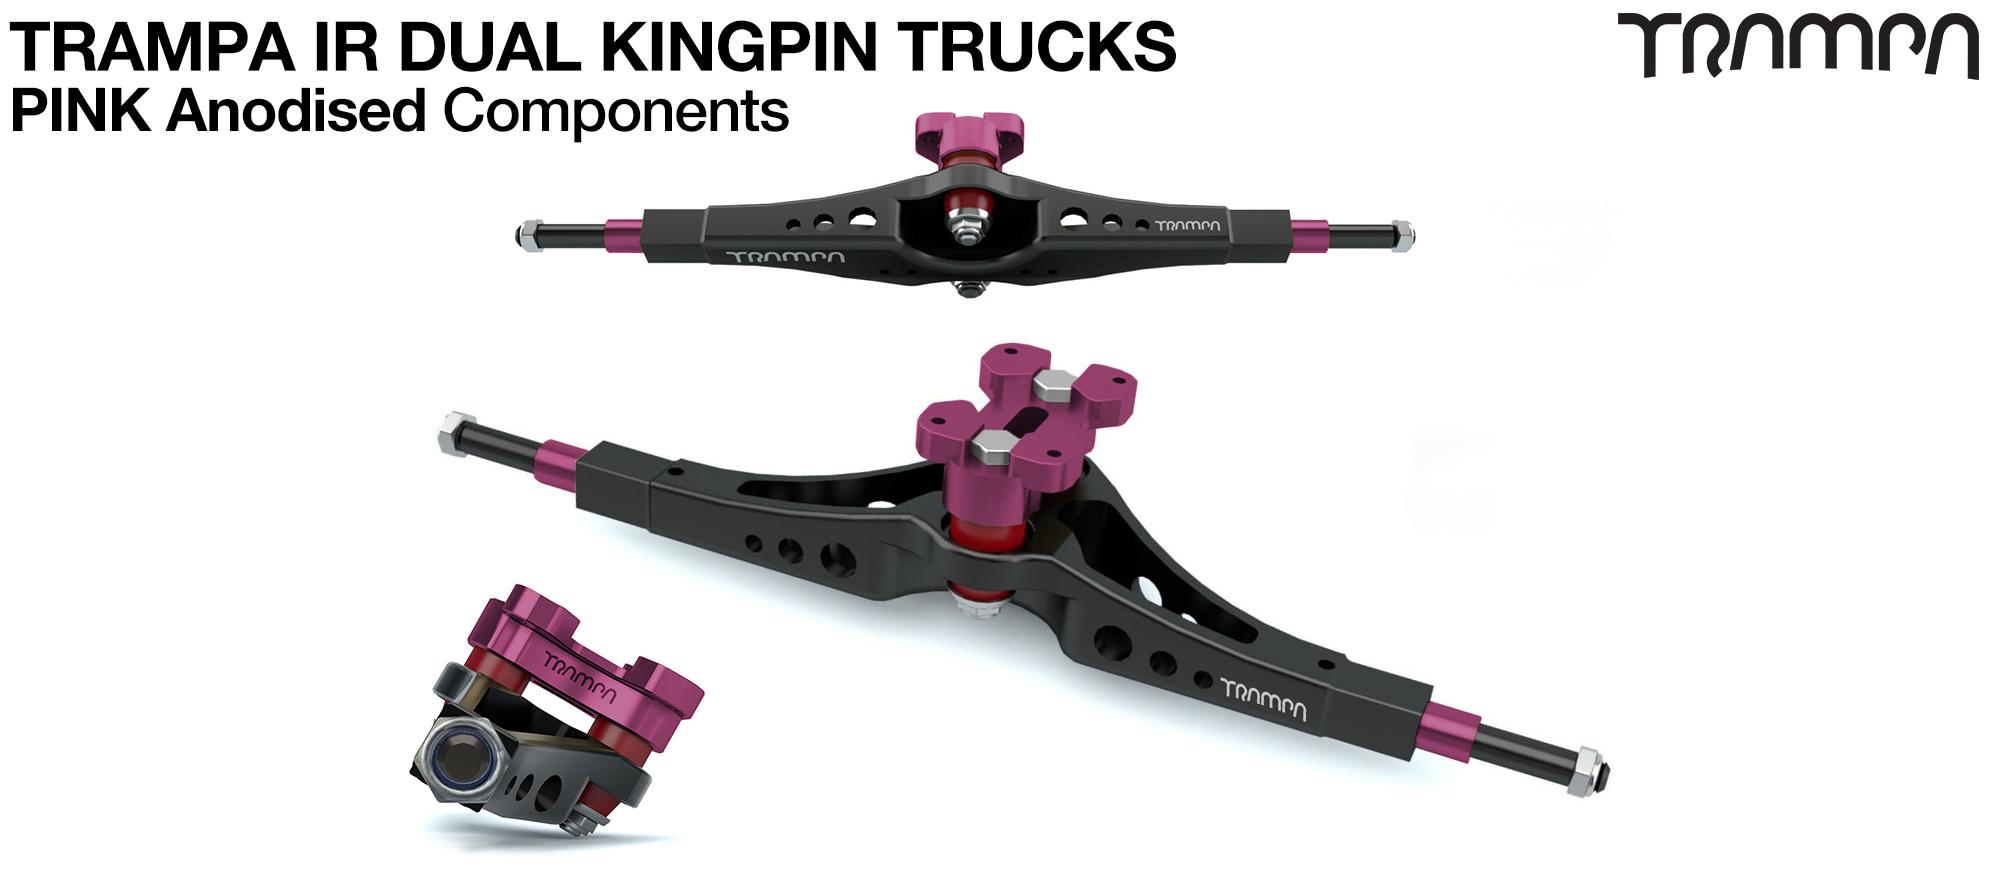 TRAMPA IR Double Kingpinned Skate Style Trucks fit every 19.1mm Motor Mount TRAMPA offers - PINK